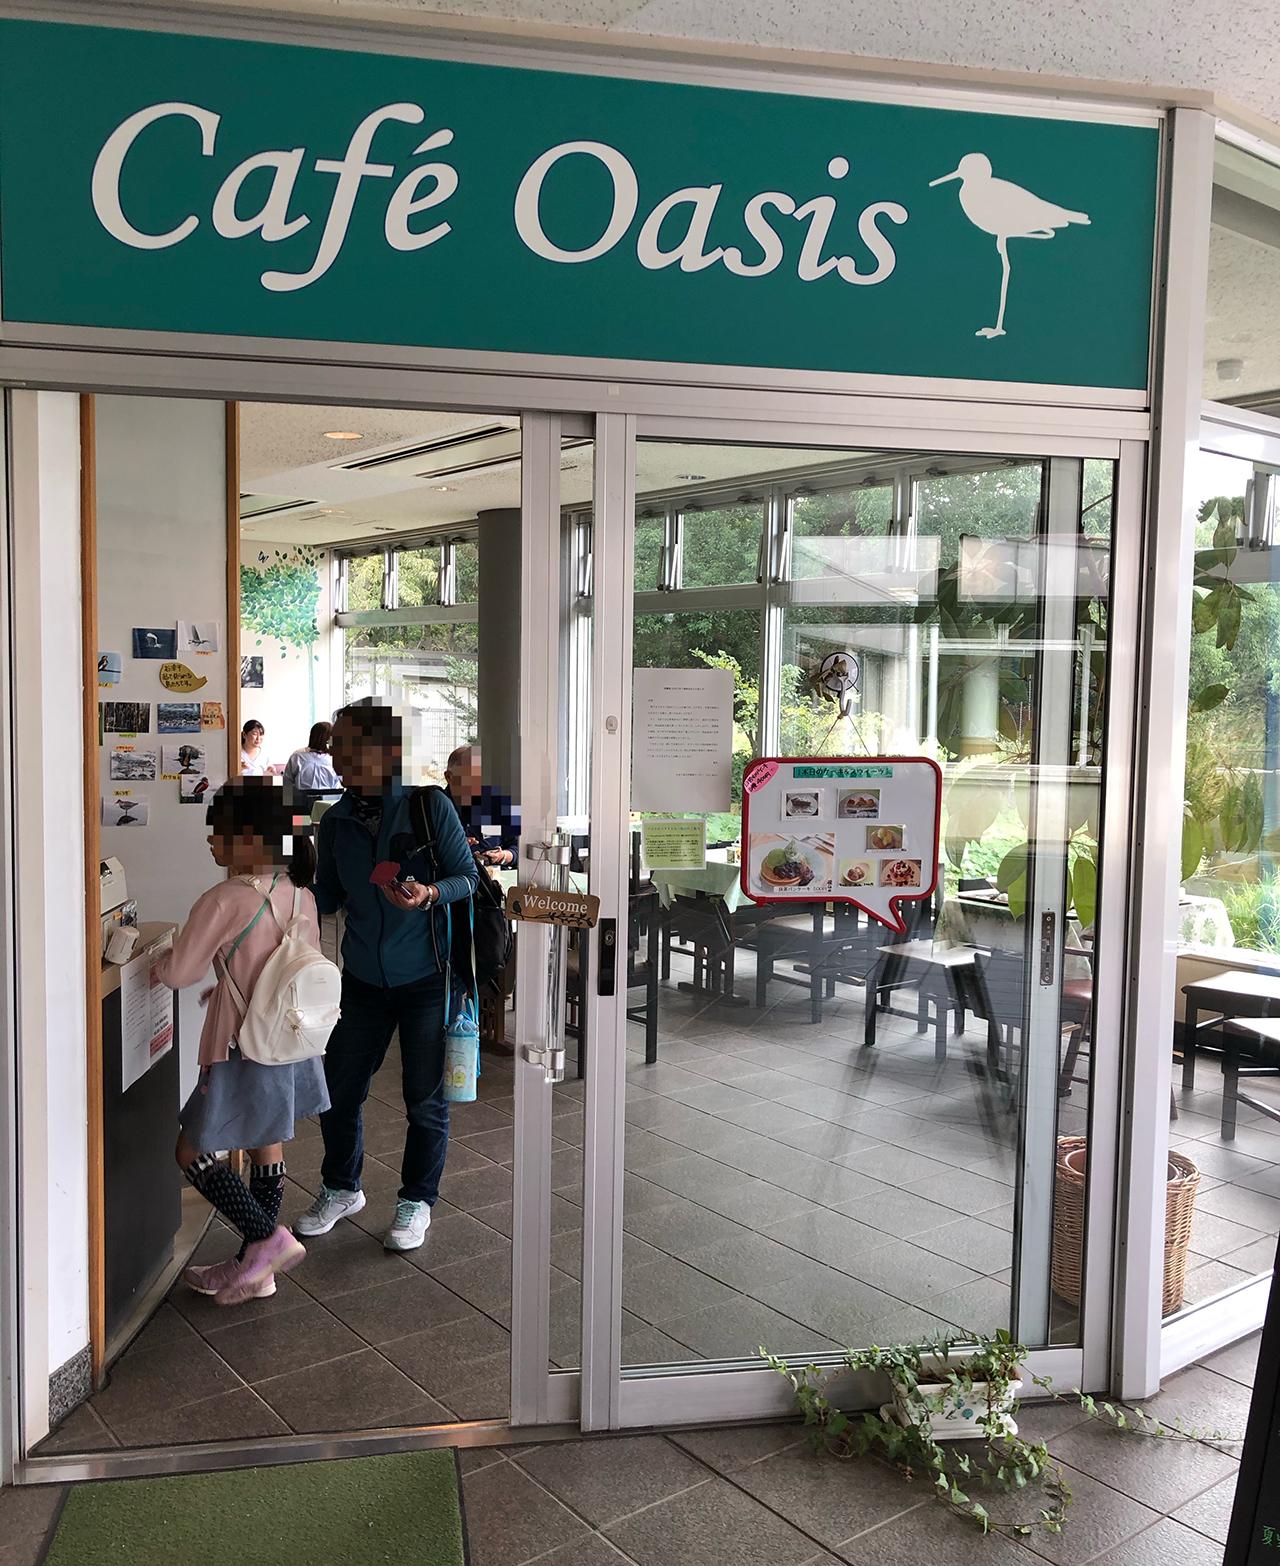 Café Oasis(カフェオアシス)の外観